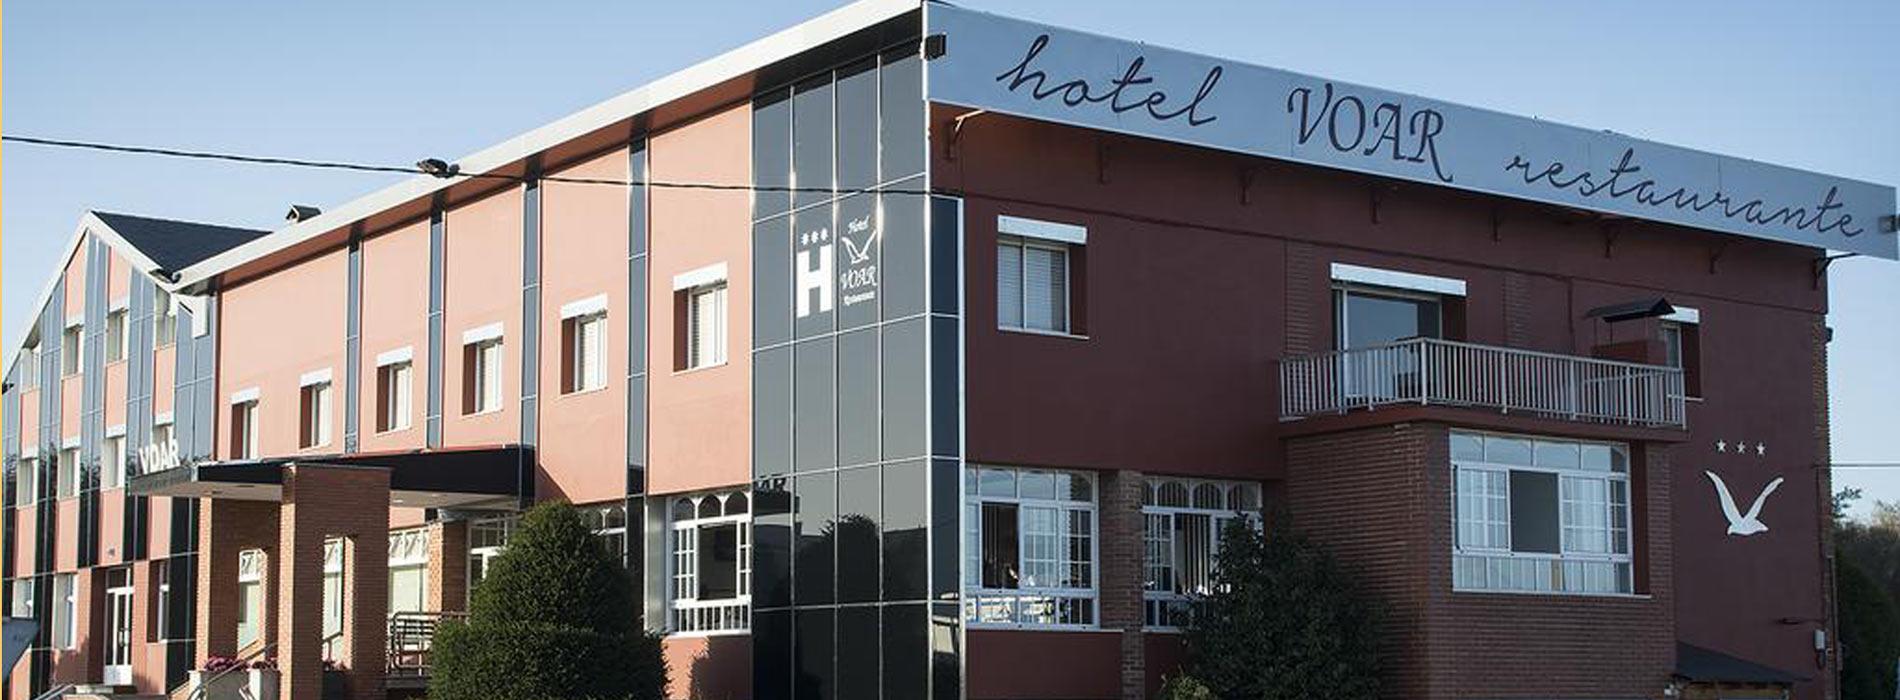 Hotel Restaurante Voar  galeria